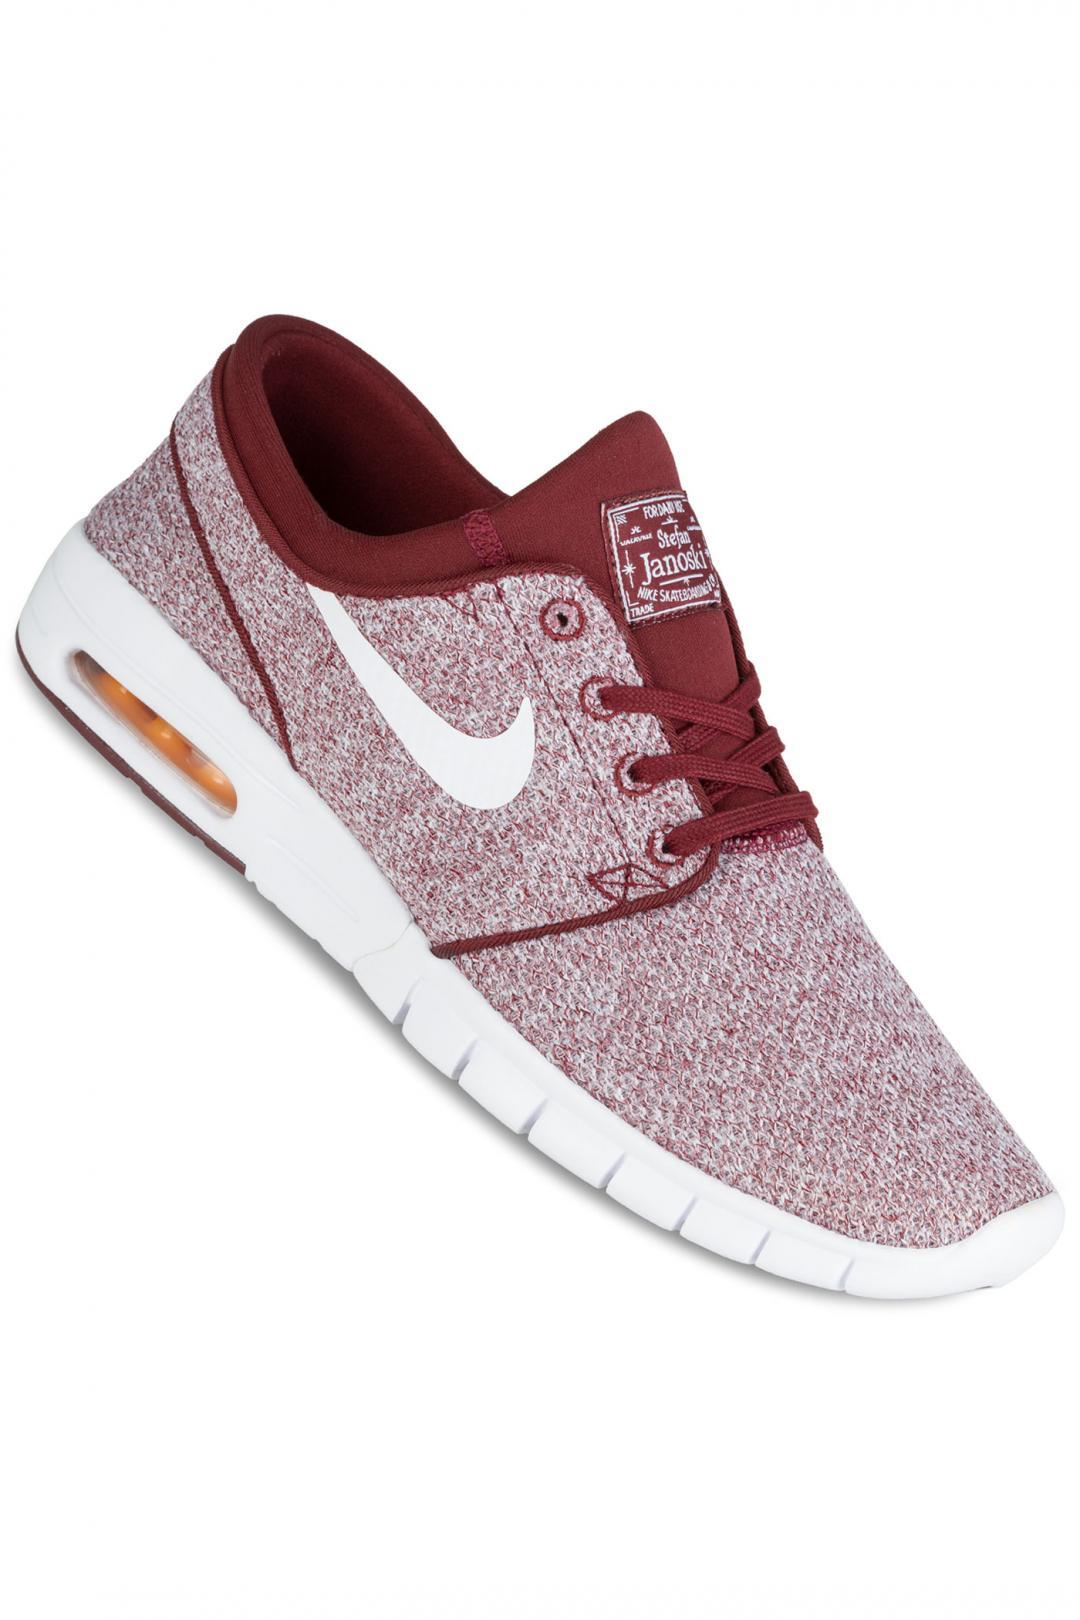 Uomo Nike SB Stefan Janoski Max dark team red white | Sneakers low top